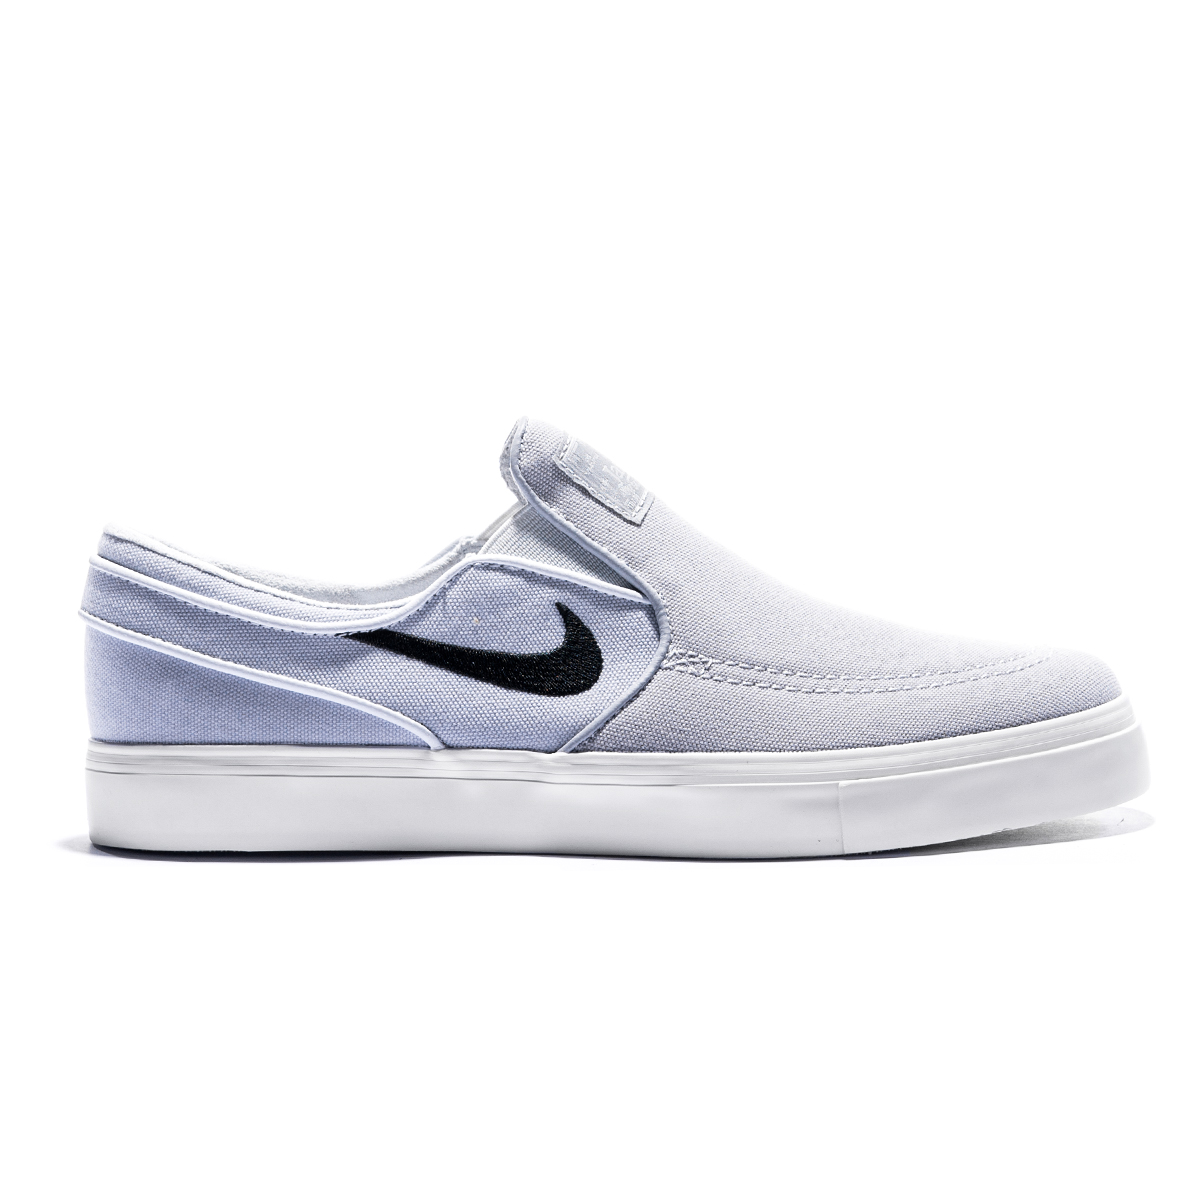 Buty Nike SB Zoom Stefan Janoski Slip Canvas Wofl Grey / Black-Pure Platinum